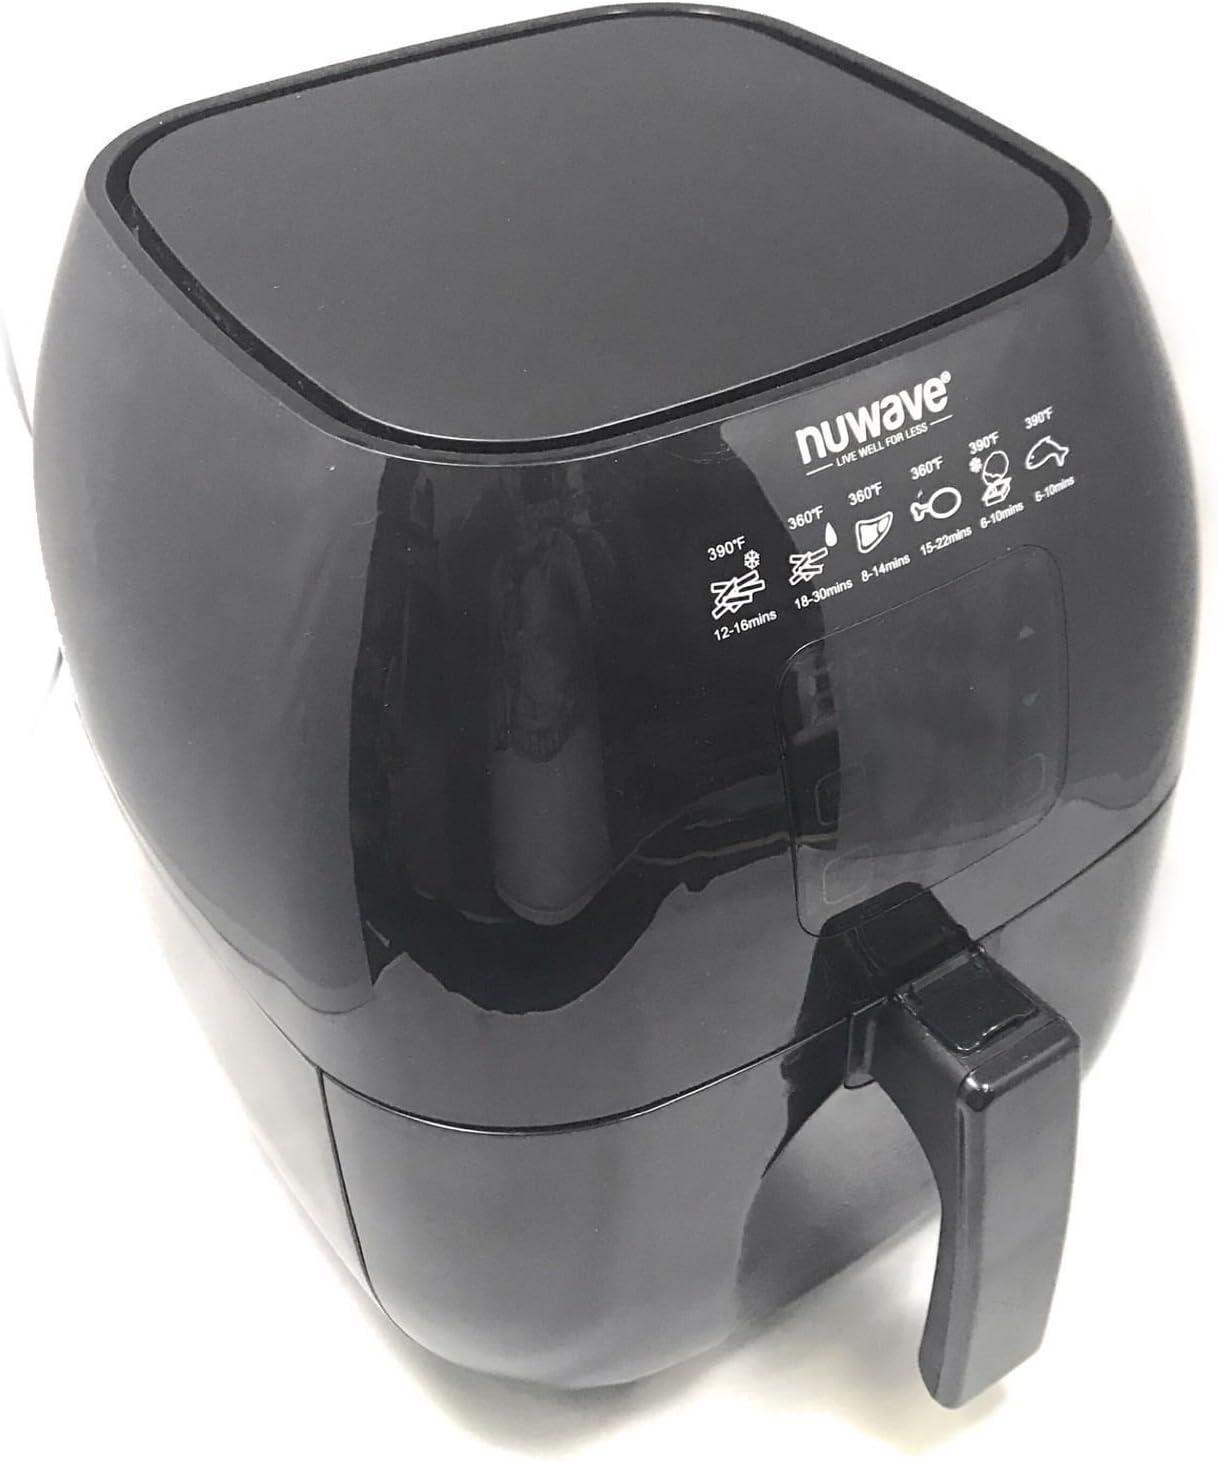 Nuwave - Brio Great interest Digital Air Reversible Fryer Capacity Super sale period limited 3 Quart